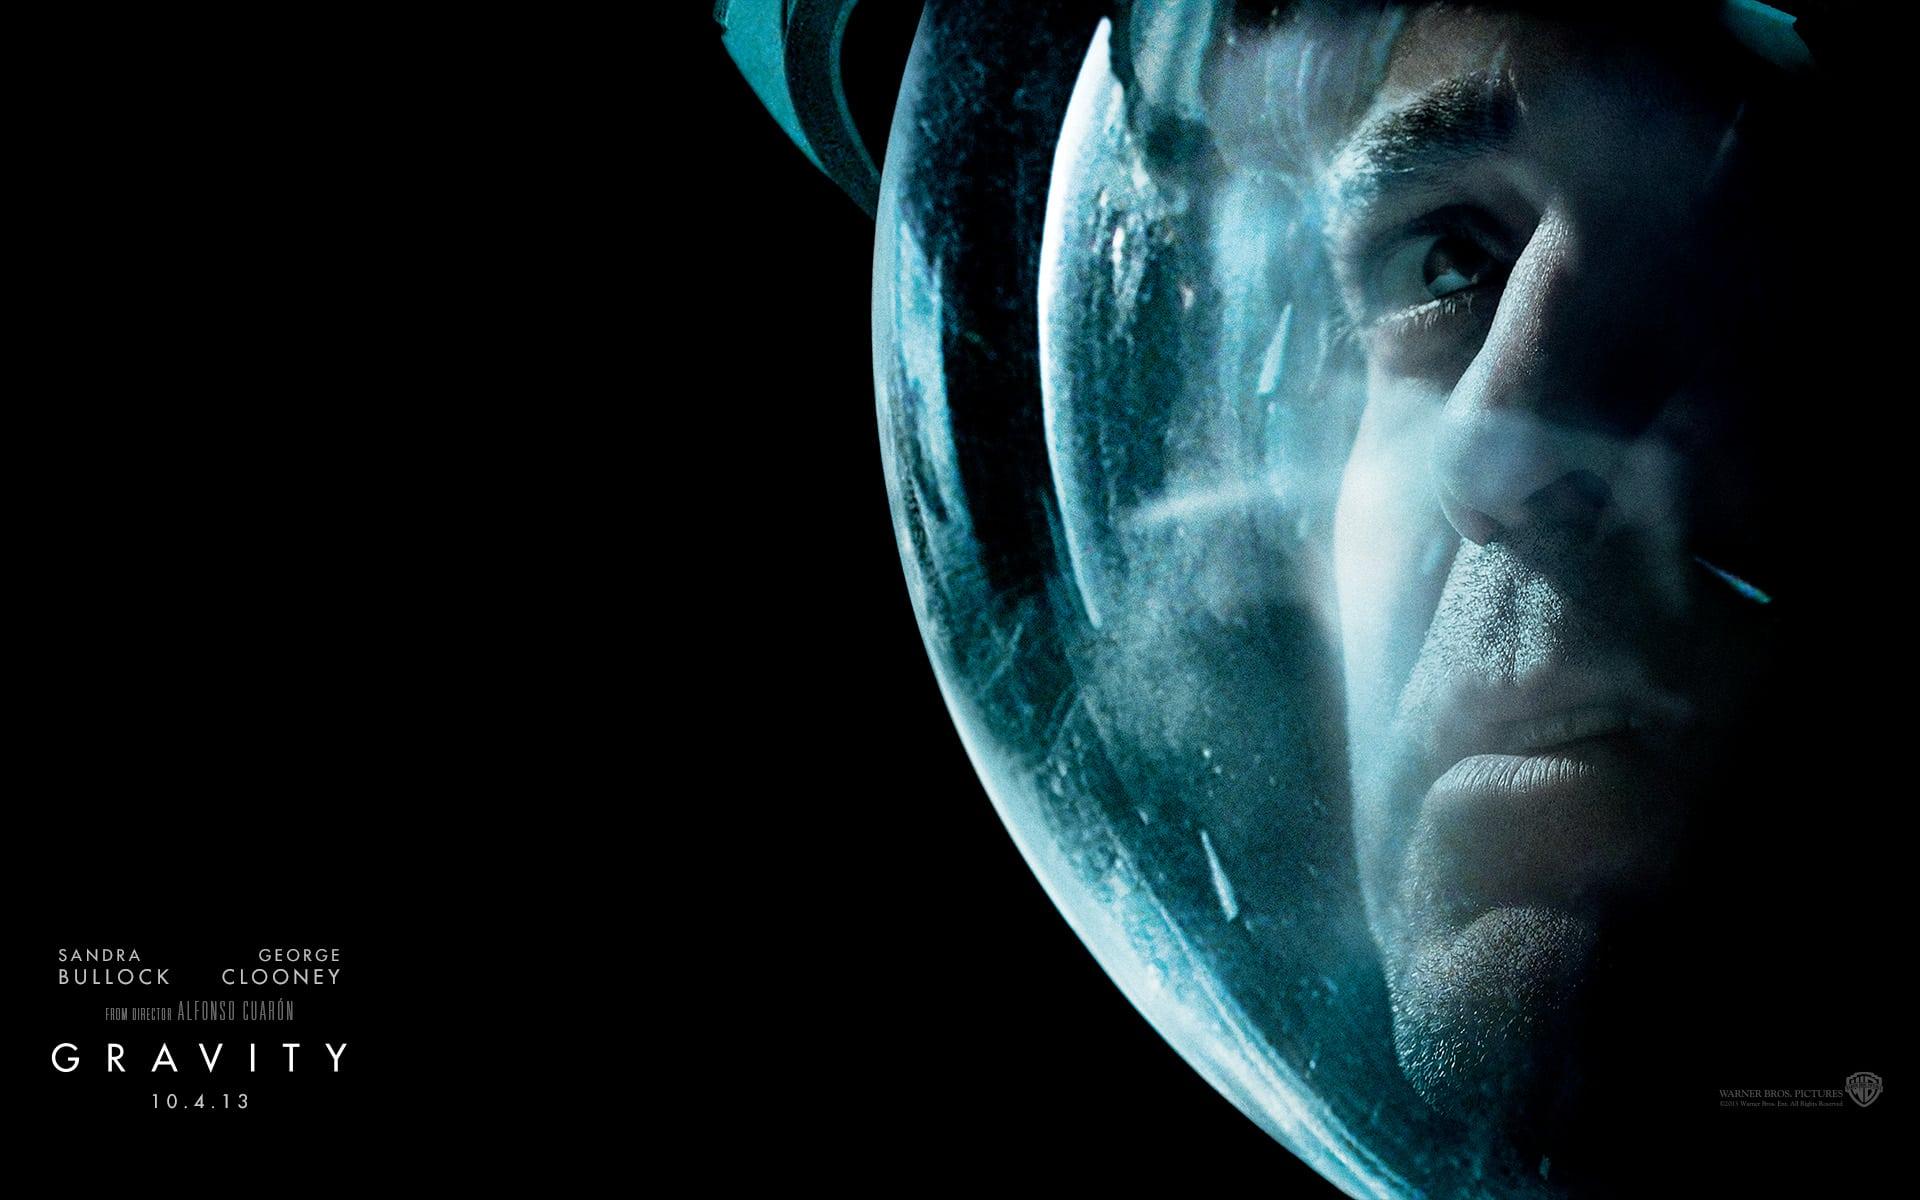 Oscar and BAFTA success for Gravity